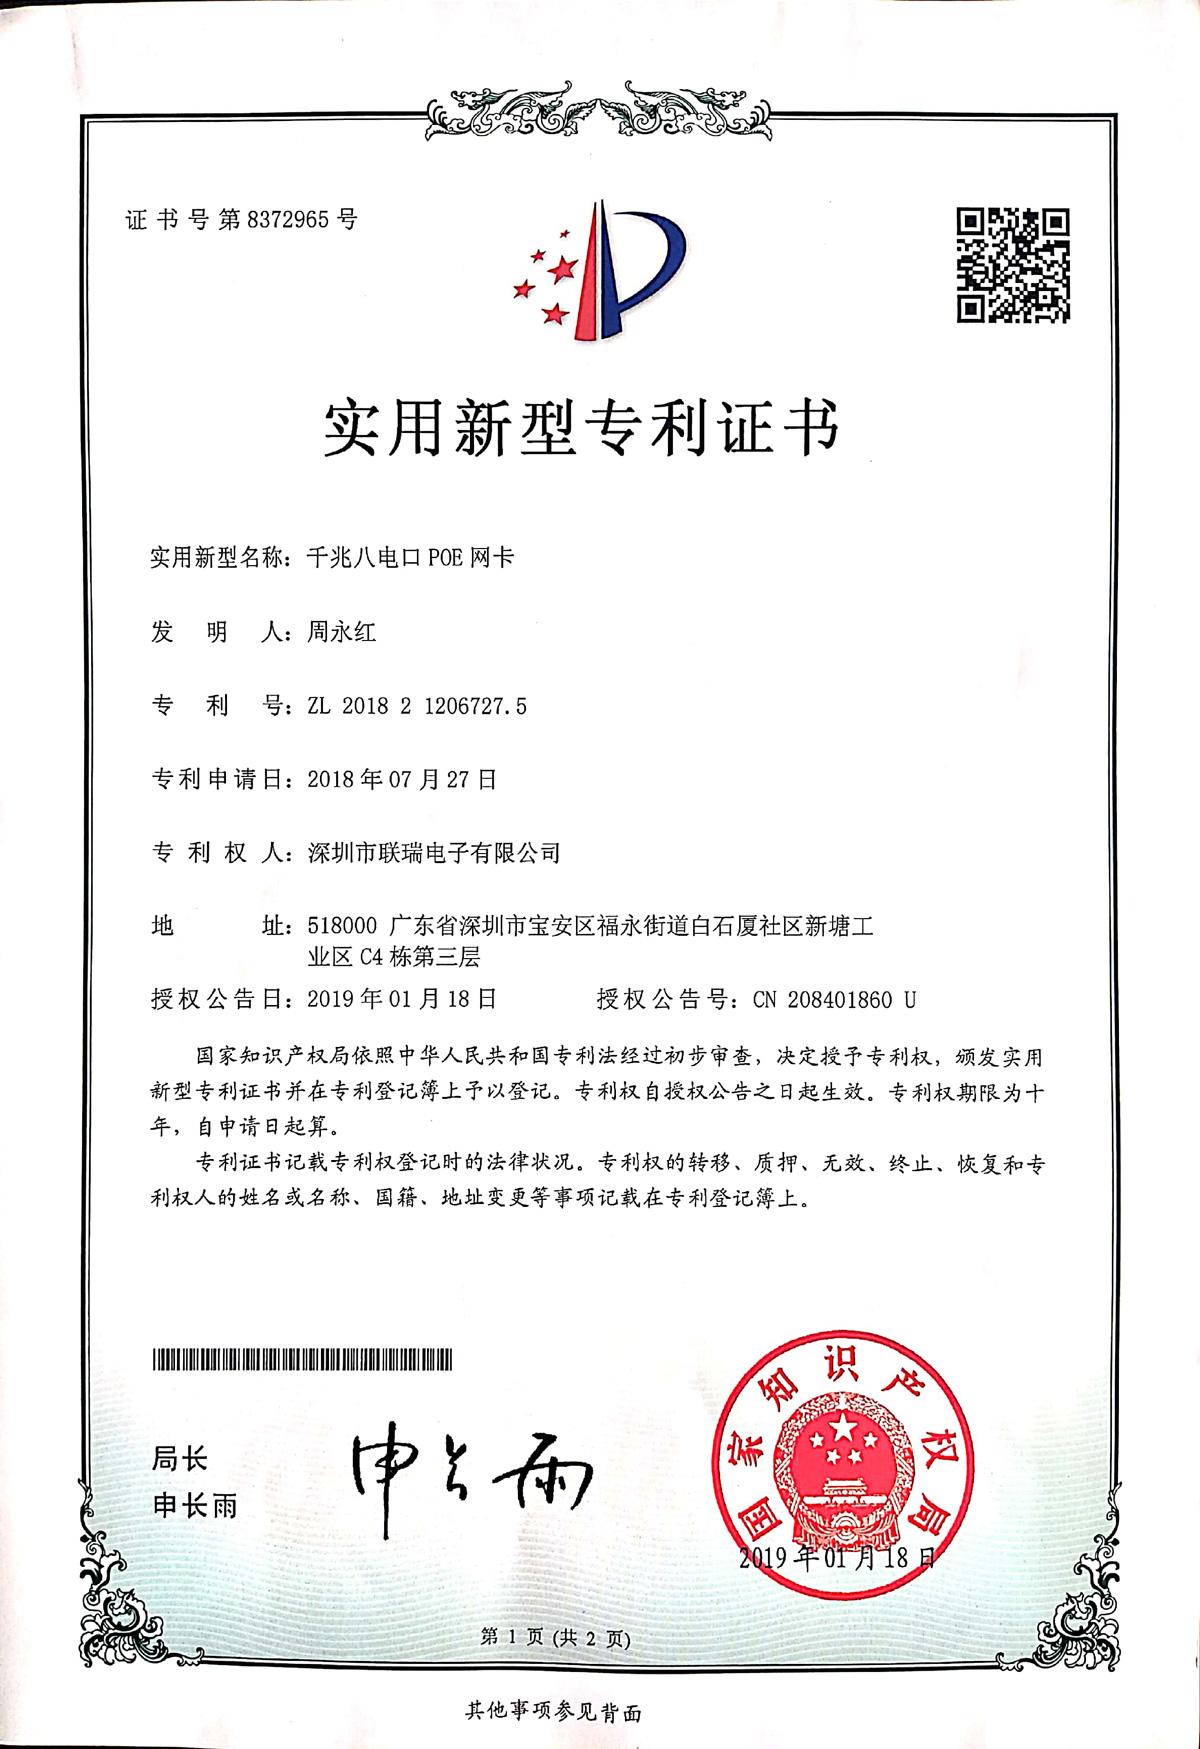 Utility model patent certificate - Gigabit eight-port POE network card